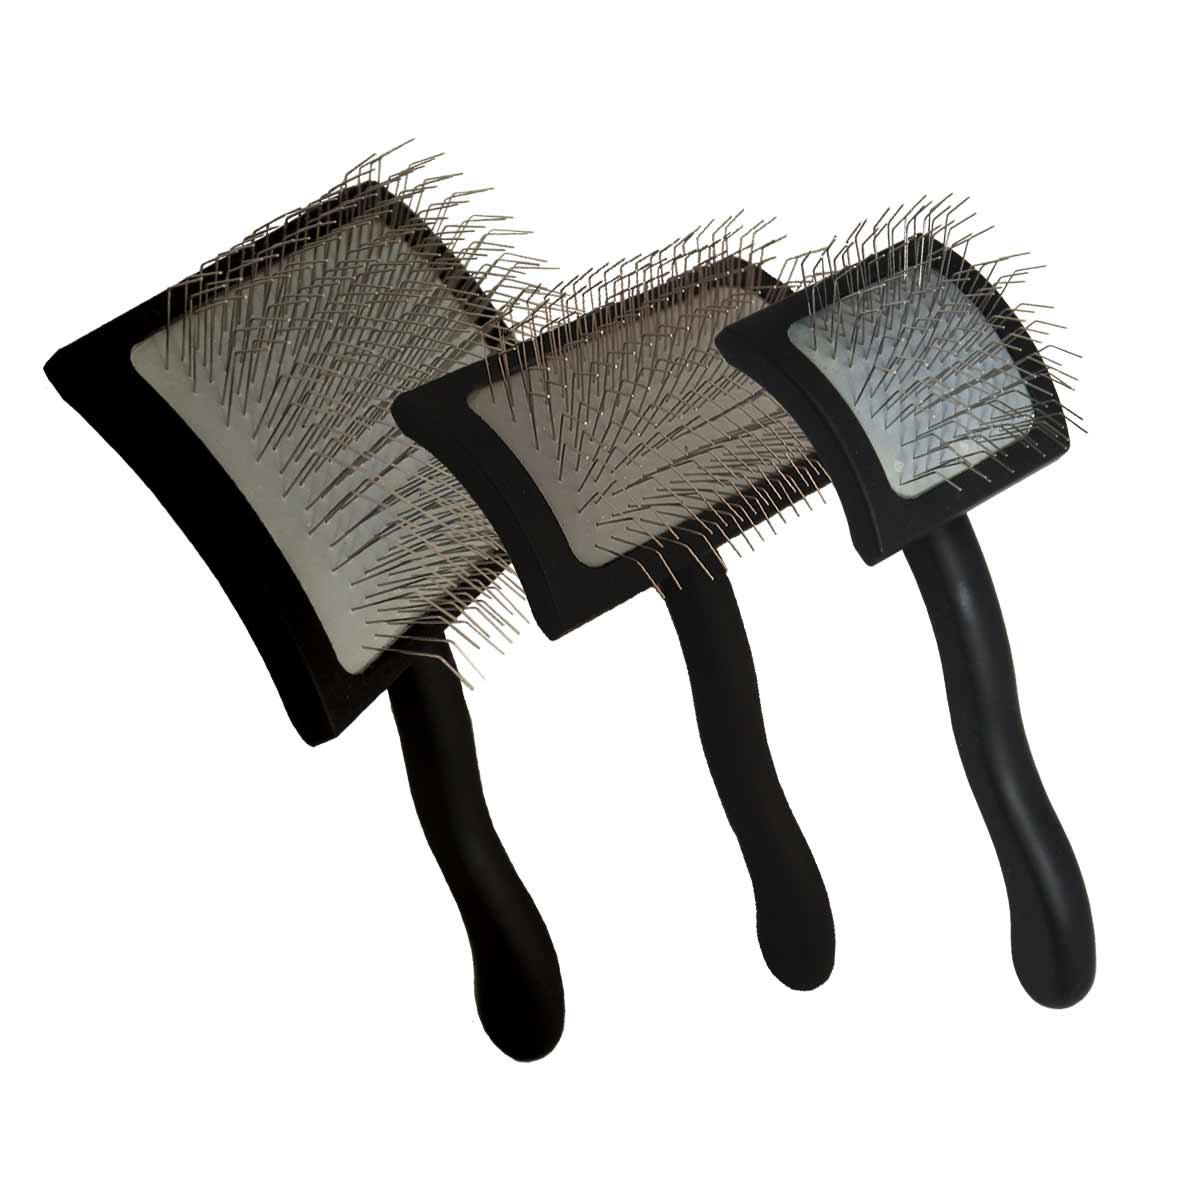 Chris Christensen Big K Black Slickers - Groomers' Miracle Brushes